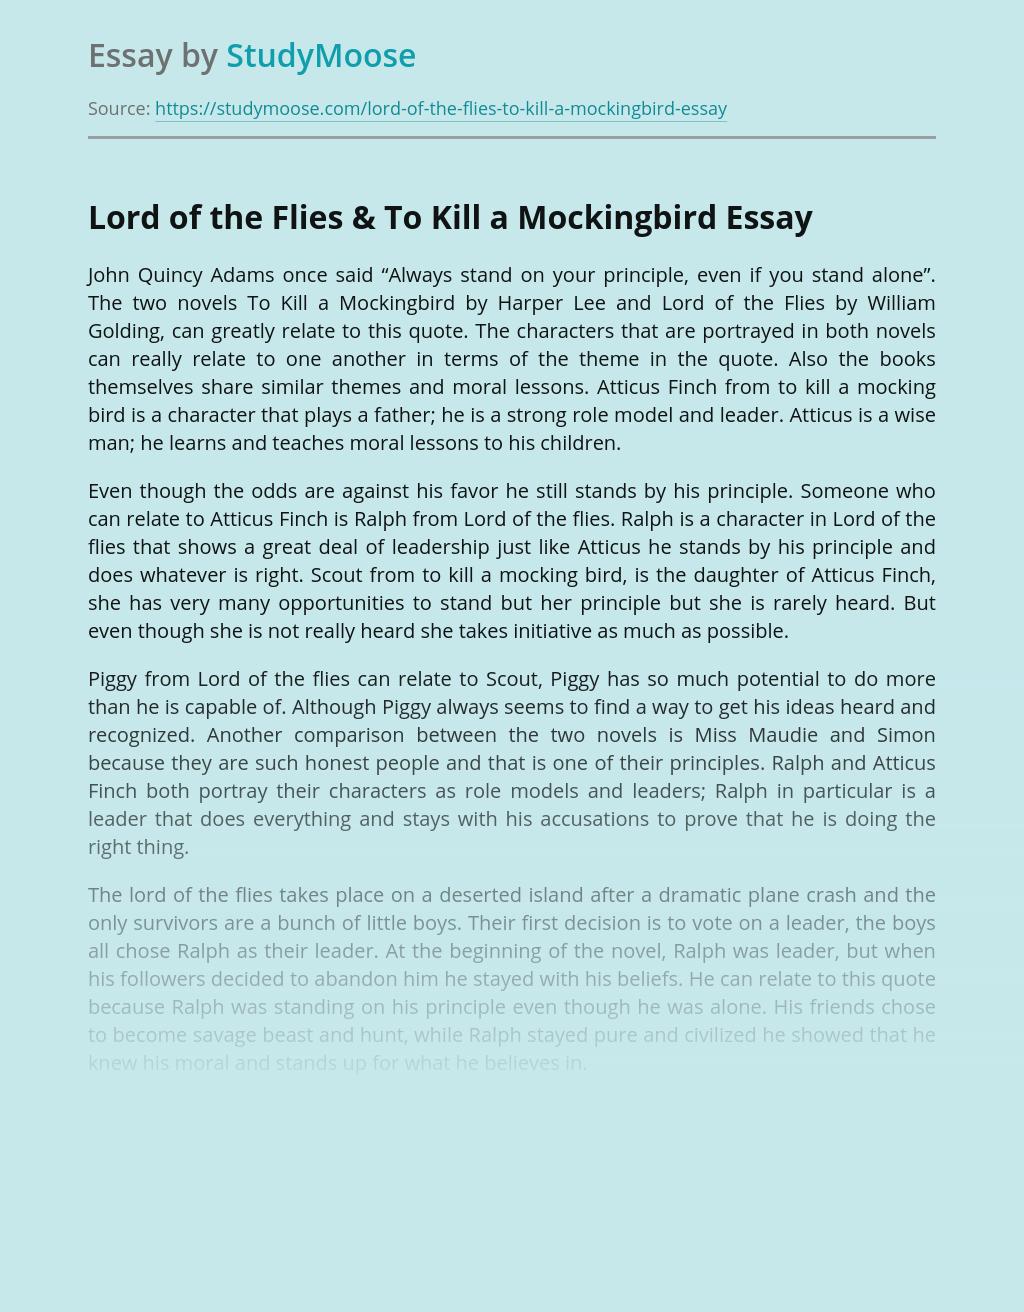 Lord of the Flies & To Kill a Mockingbird